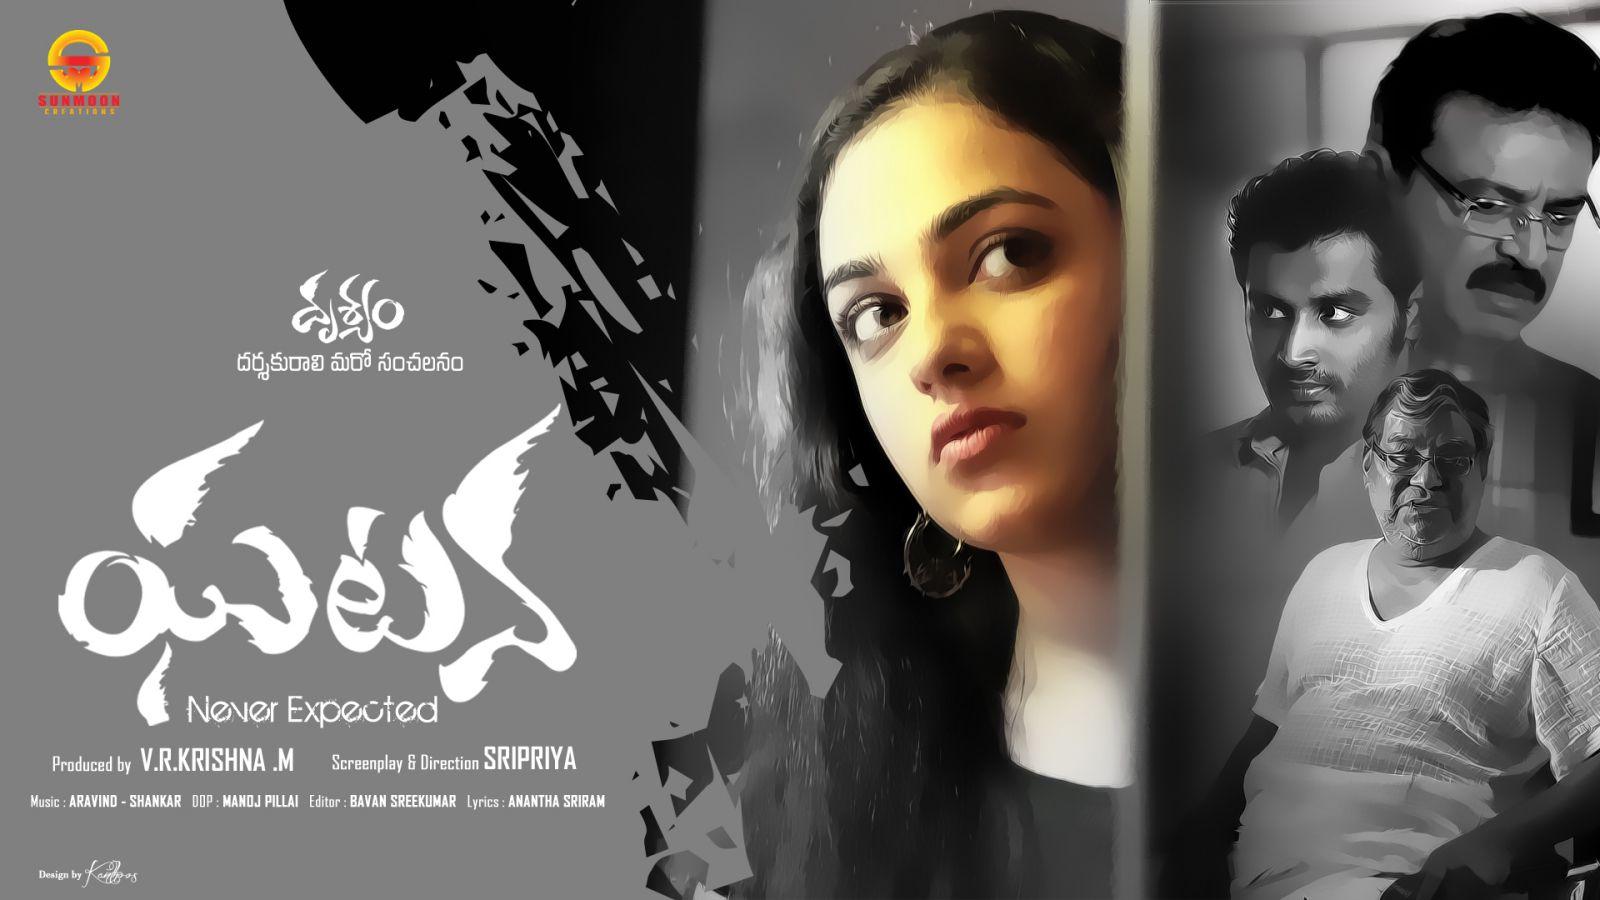 ghatana movie wallpapers-HQ-Photo-12